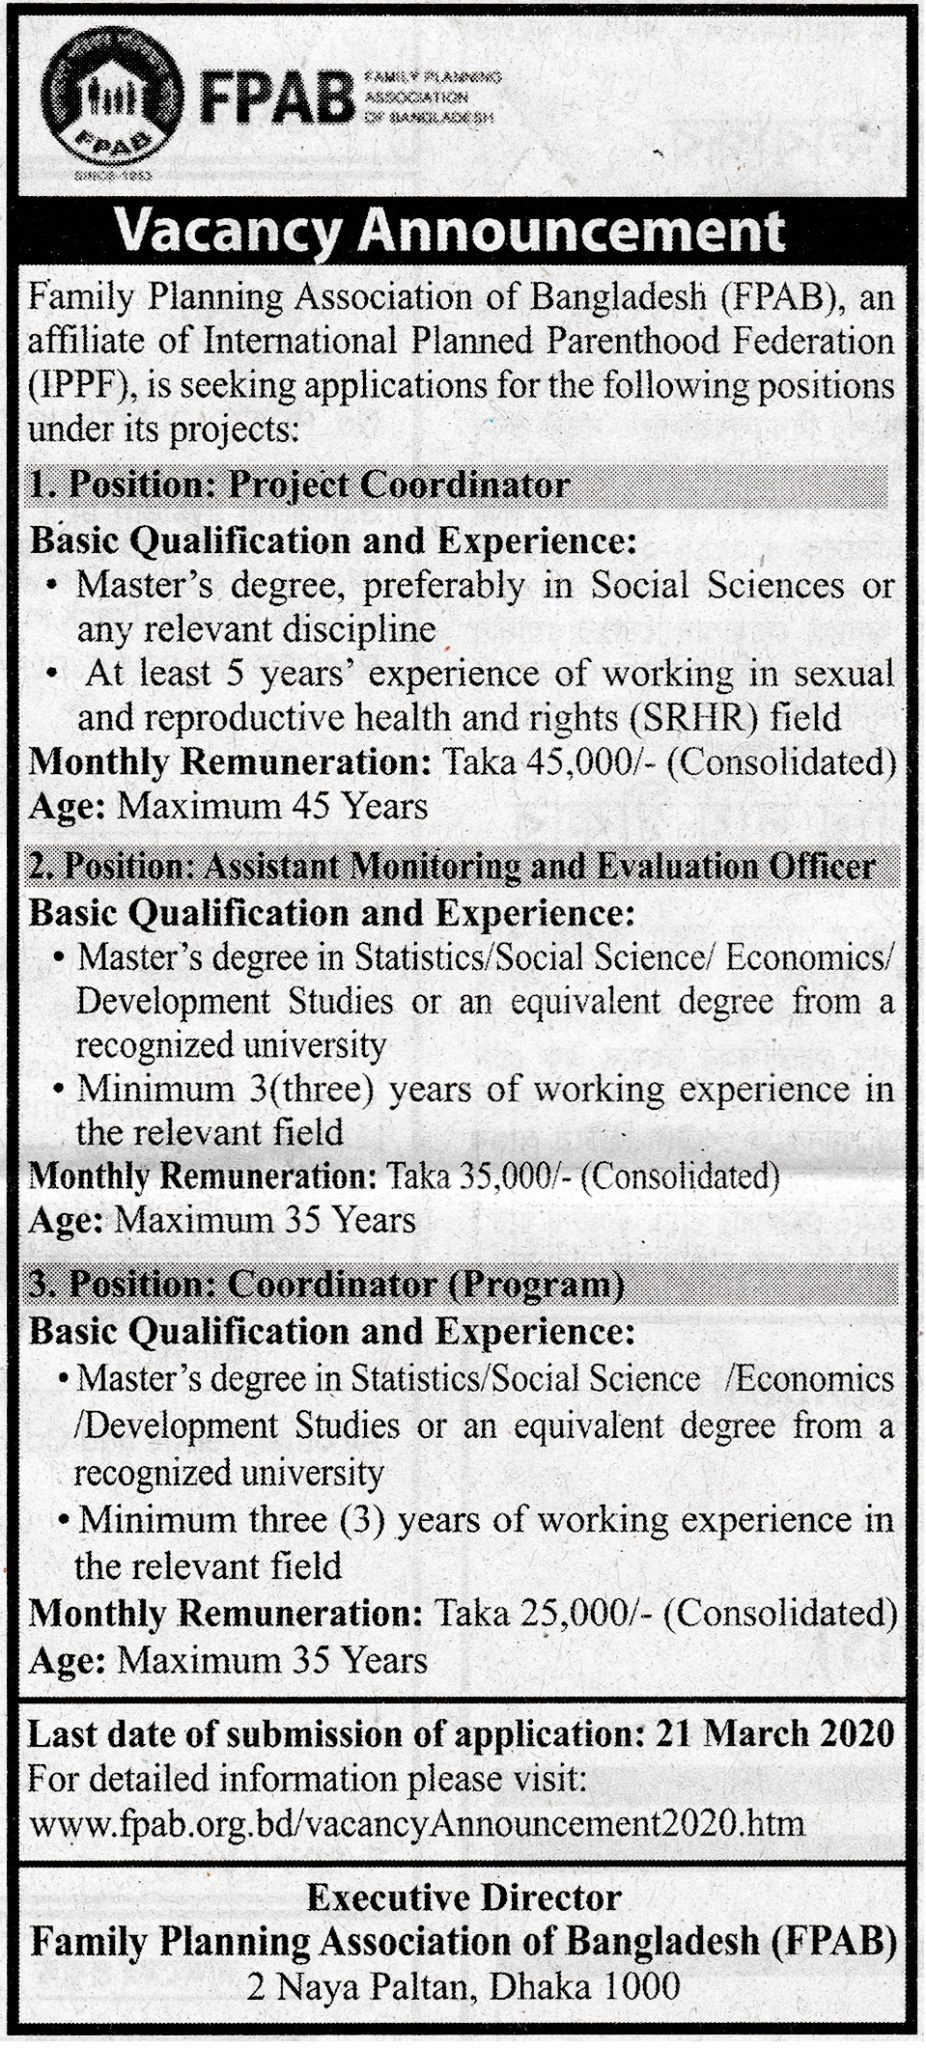 Family Planning Association of Bangladesh (FPAB) Job Circular 2020